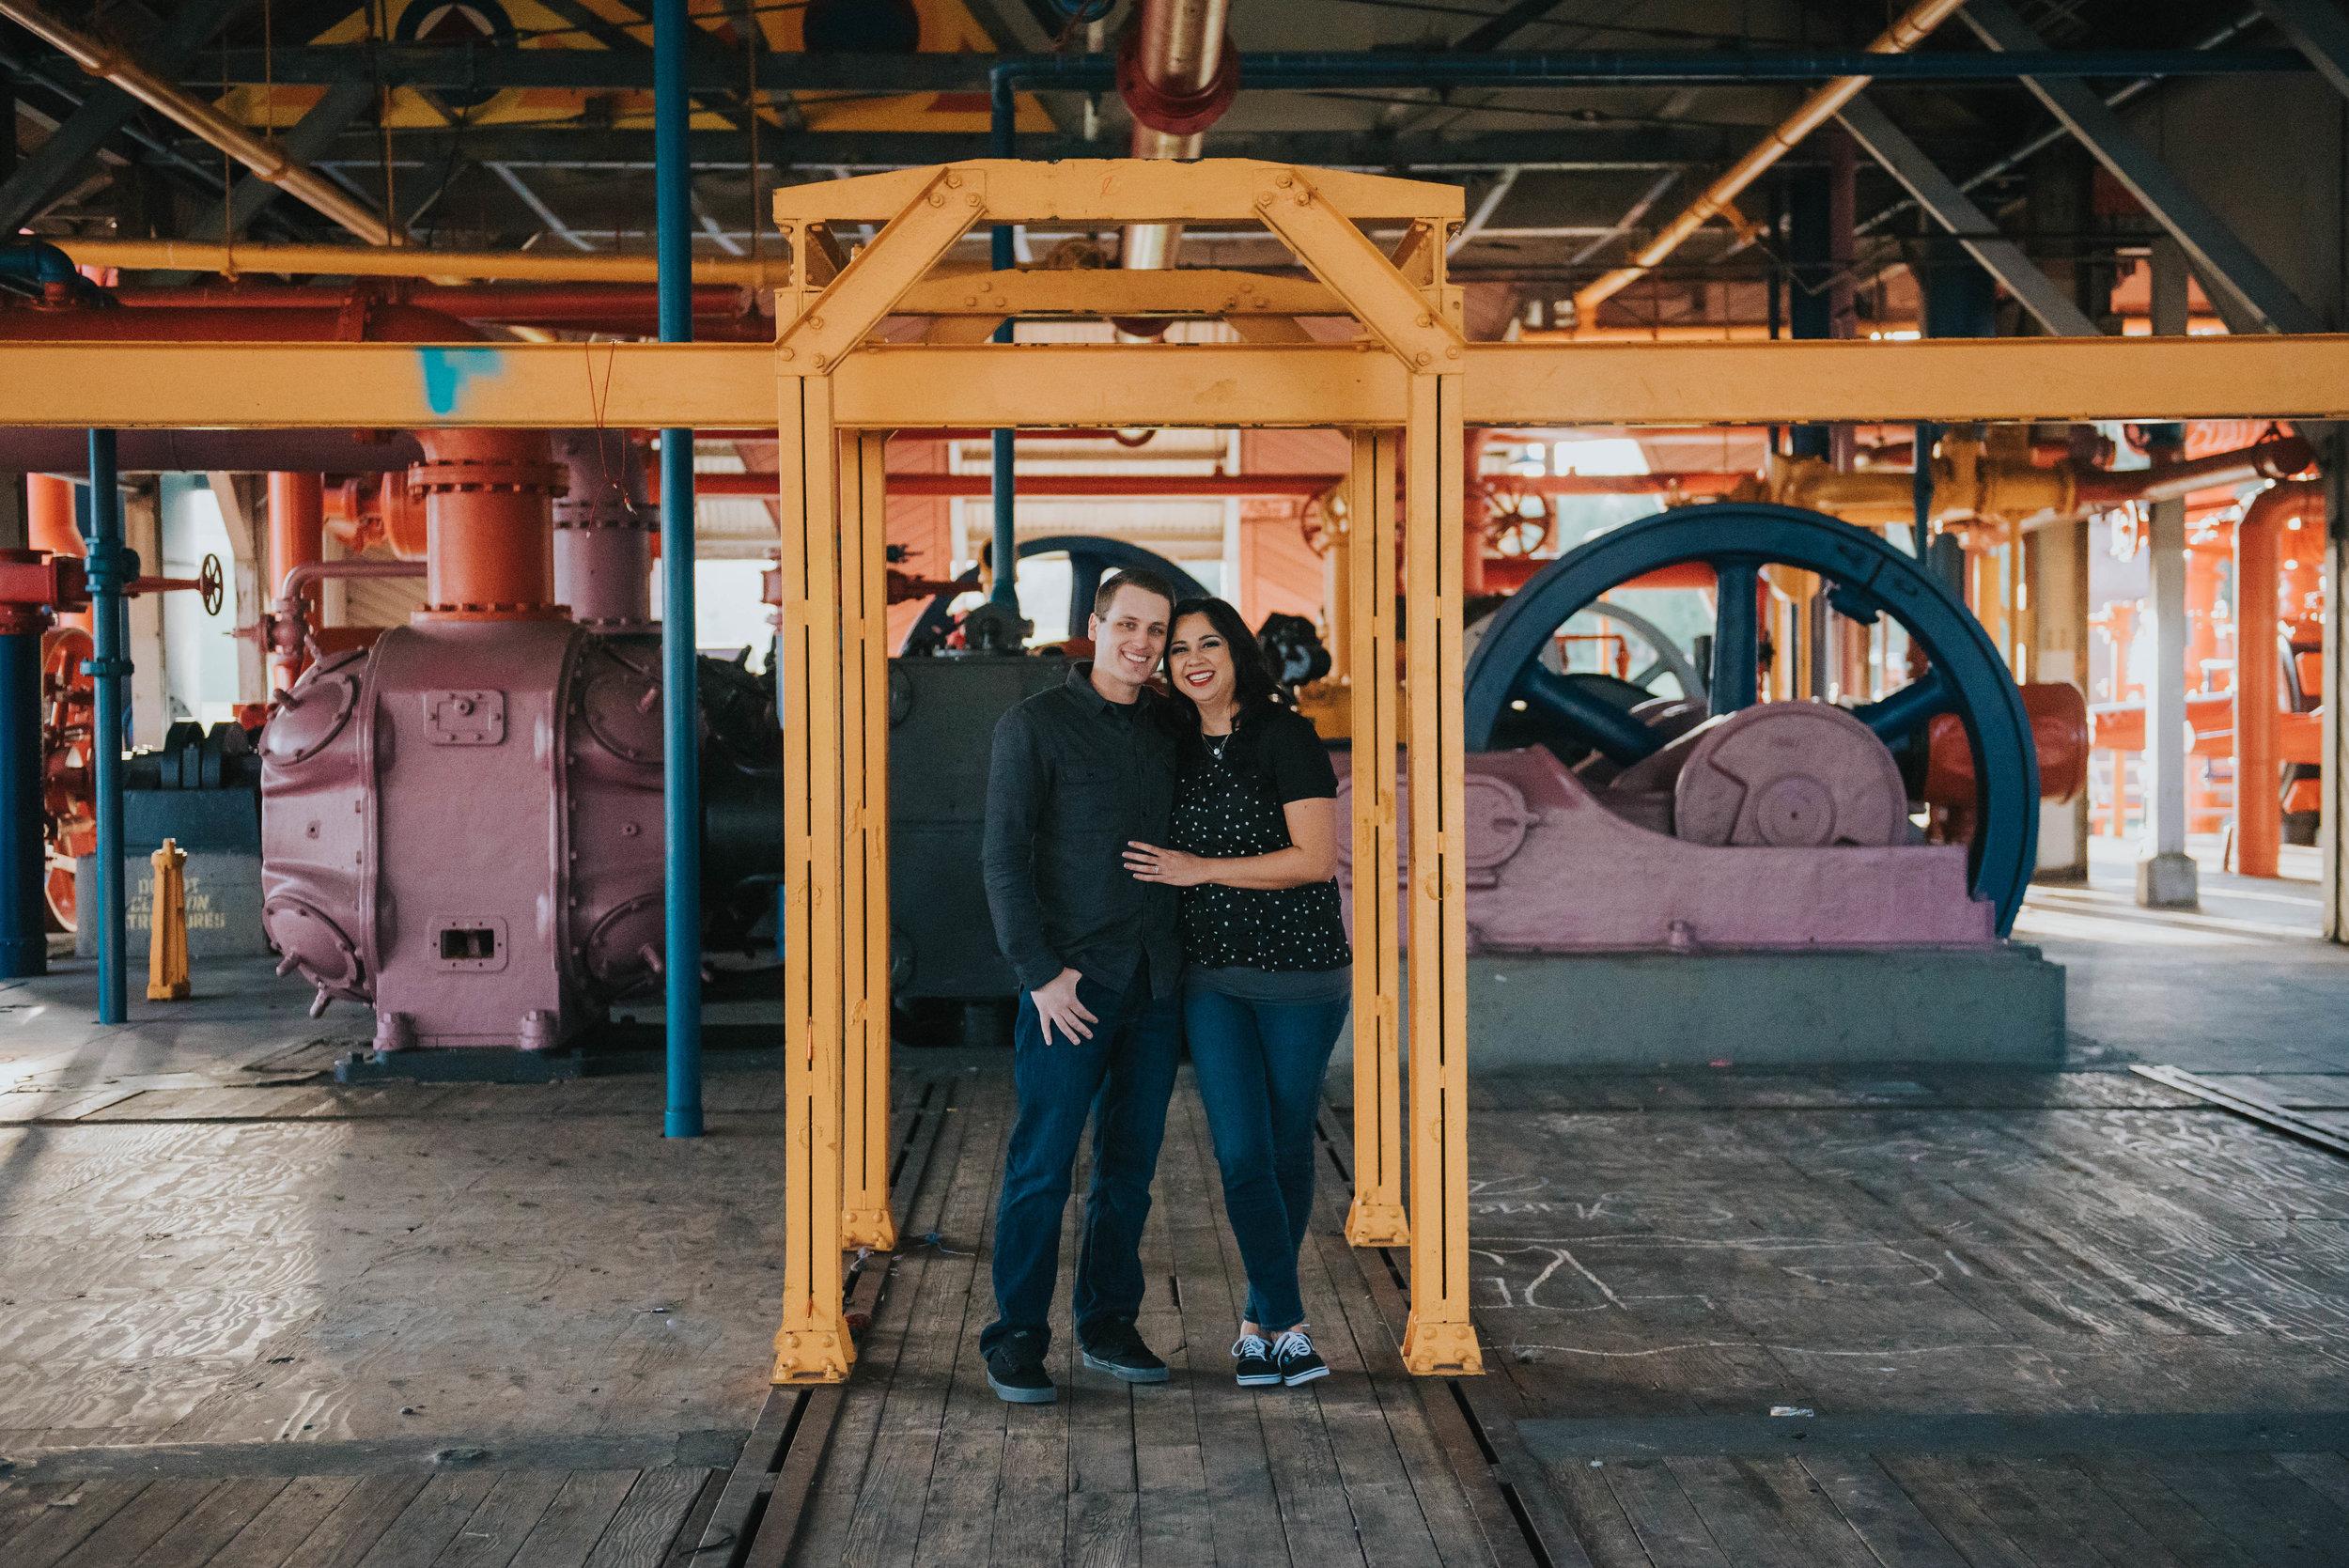 Oak-Harbor-Wedding-Photographer-J-Hodges (6 of 18).jpg